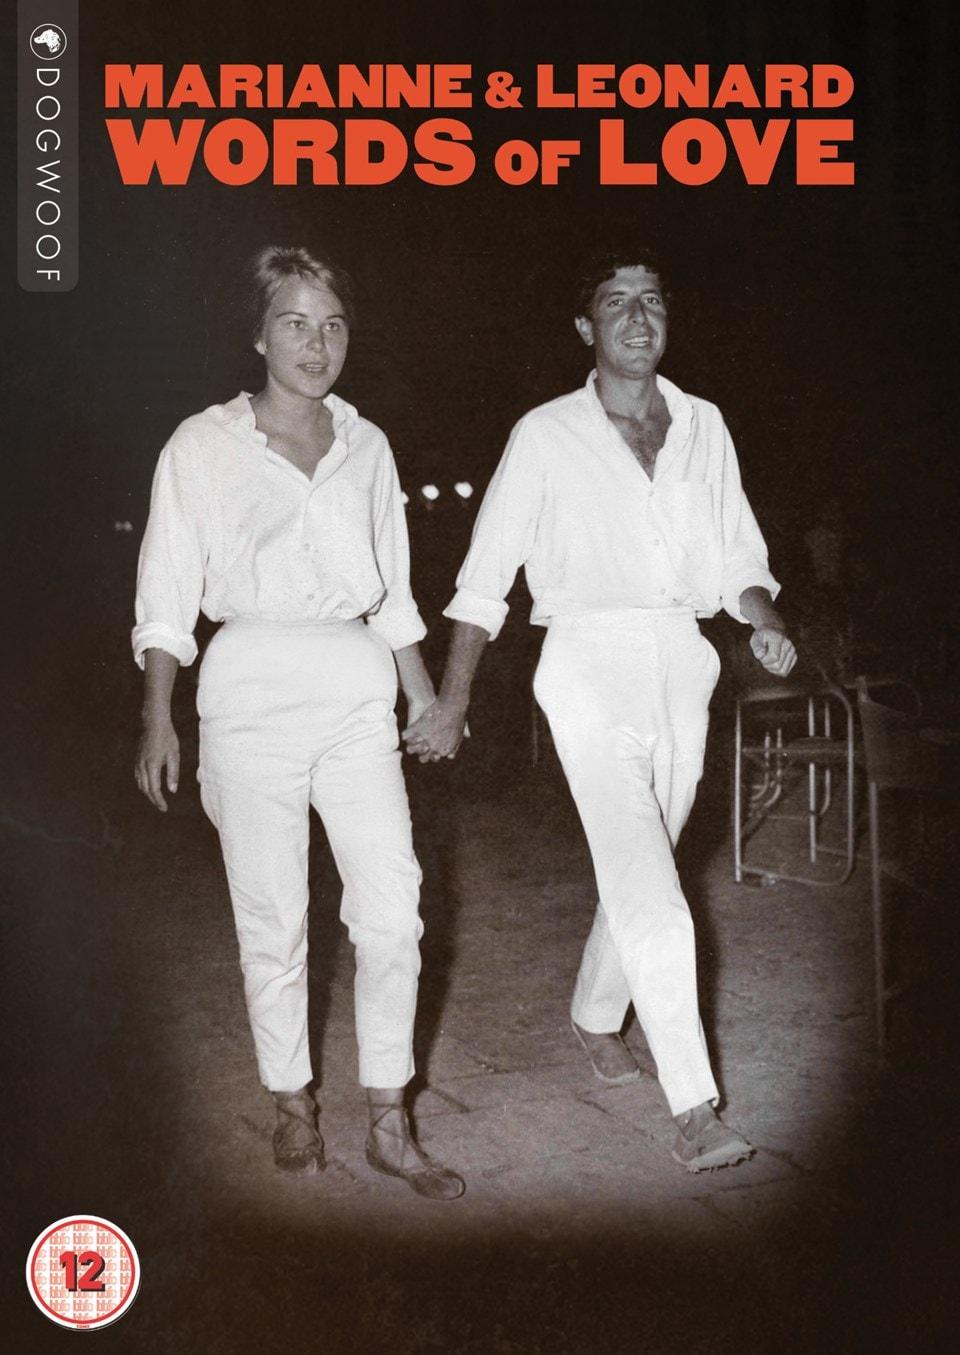 Marianne & Leonard - Words of Love - 1